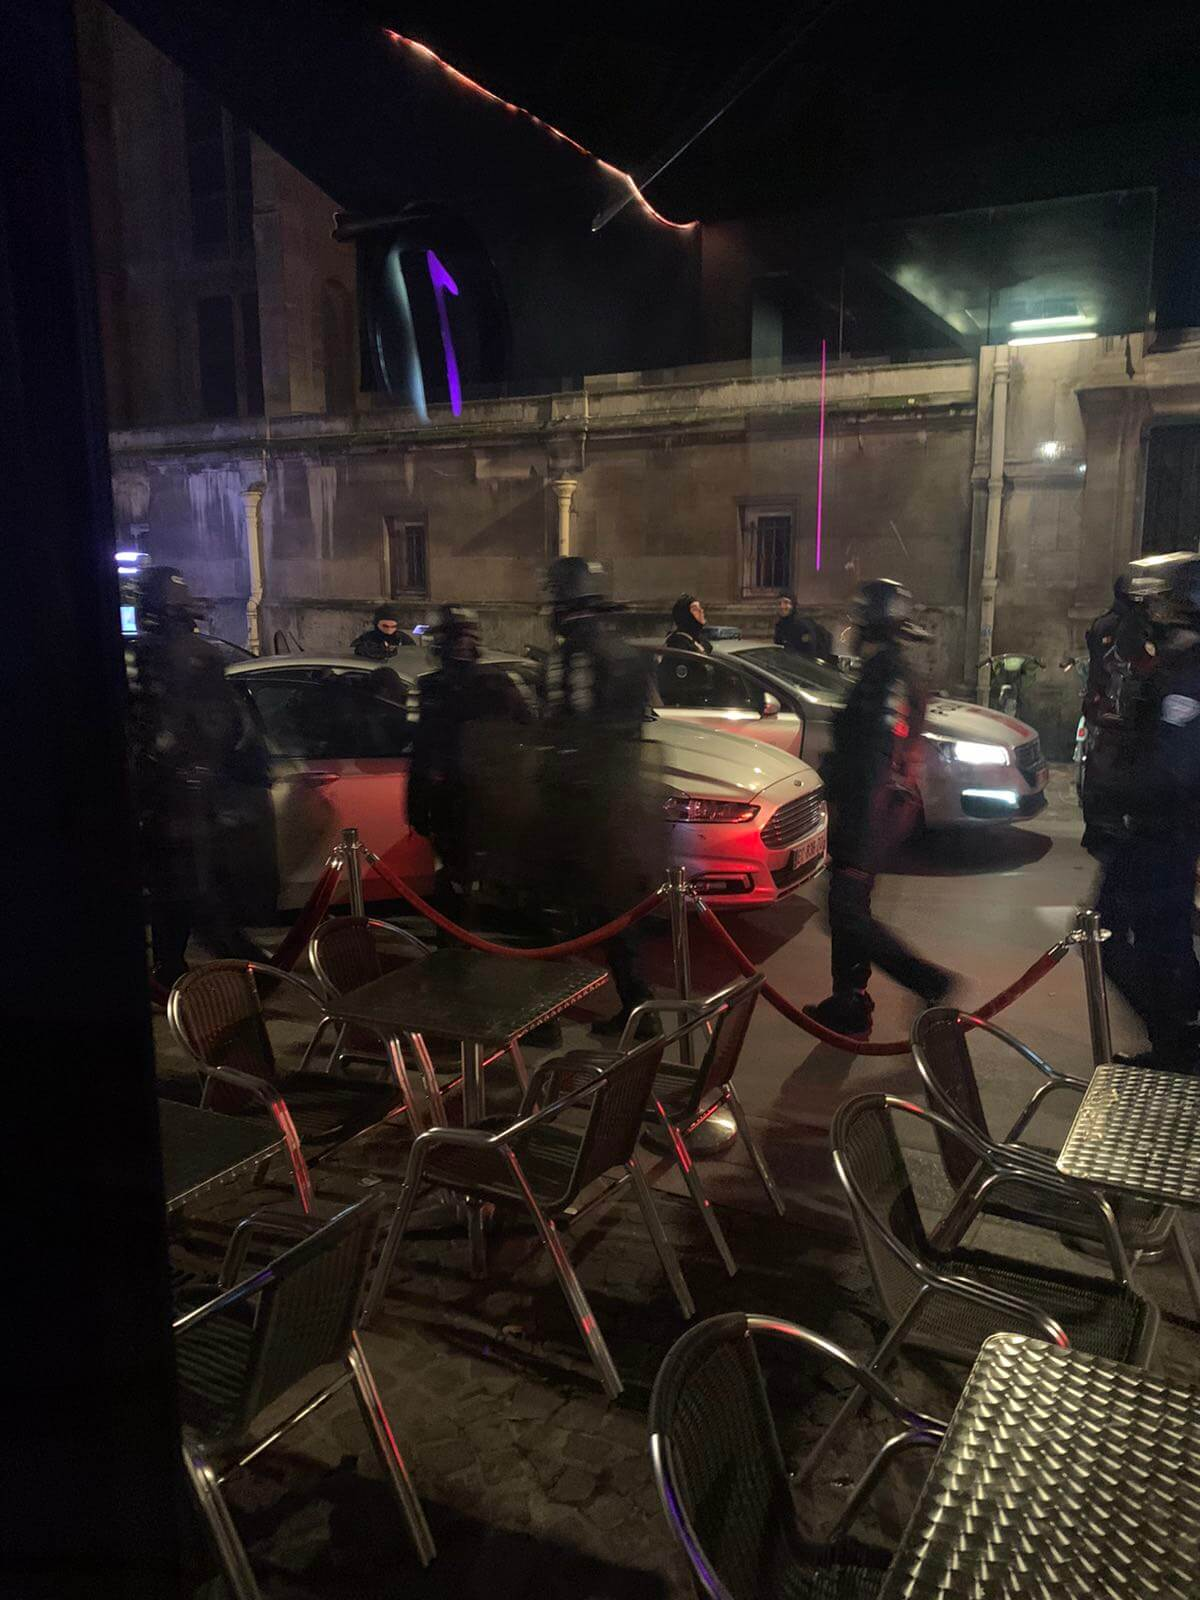 An American tourist in Paris tonight: Spooky